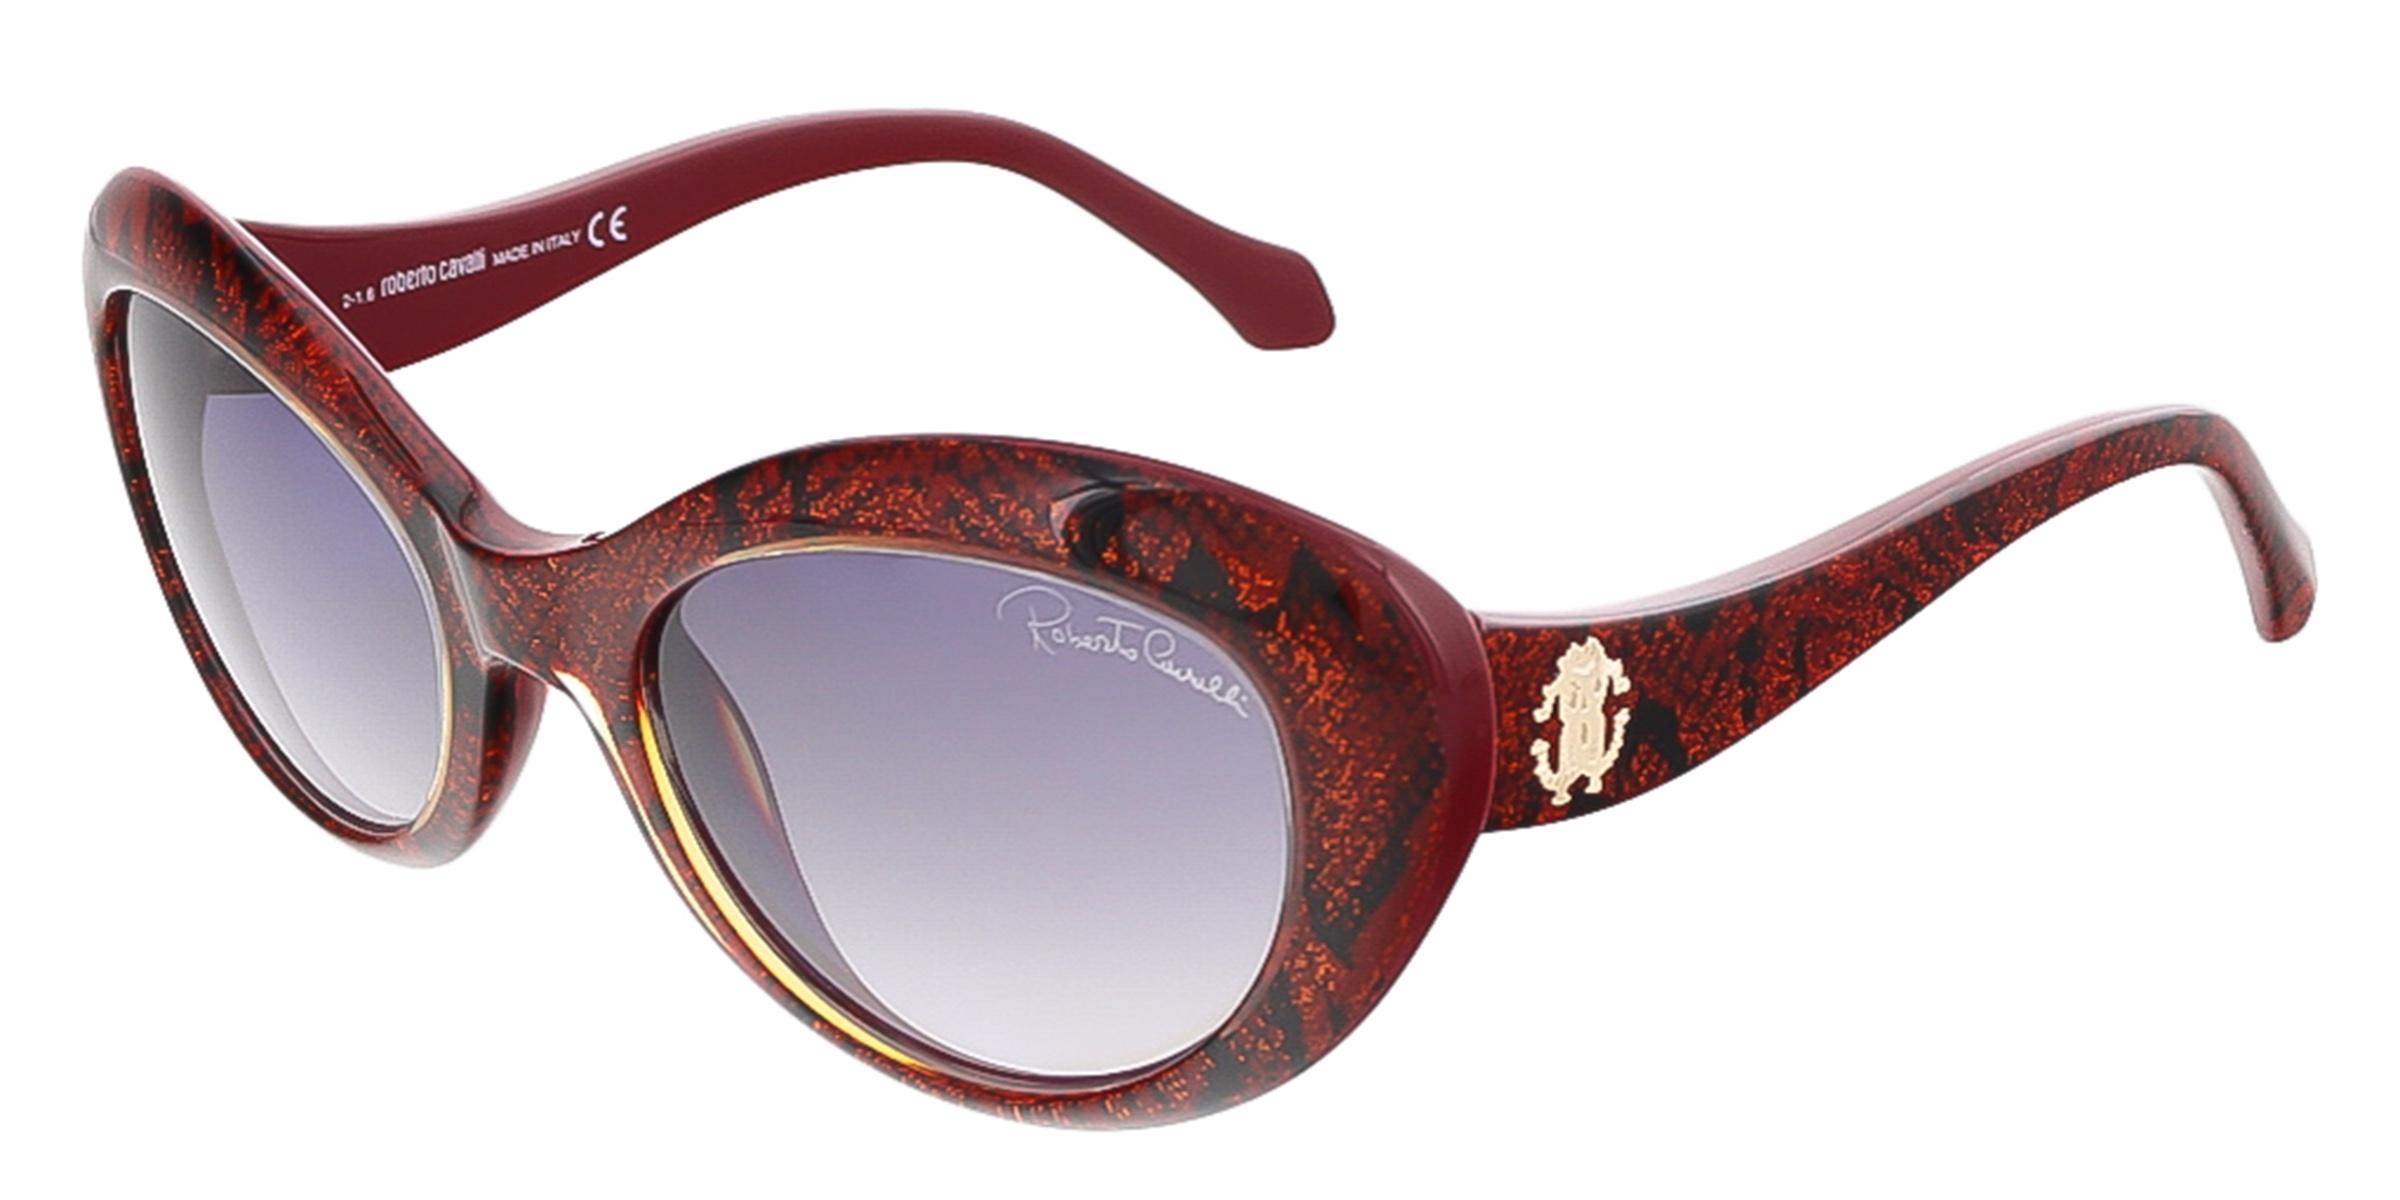 Roberto Cavalli RC826S/S 69T ALSHAT Glitter Red Cateye sunglasses